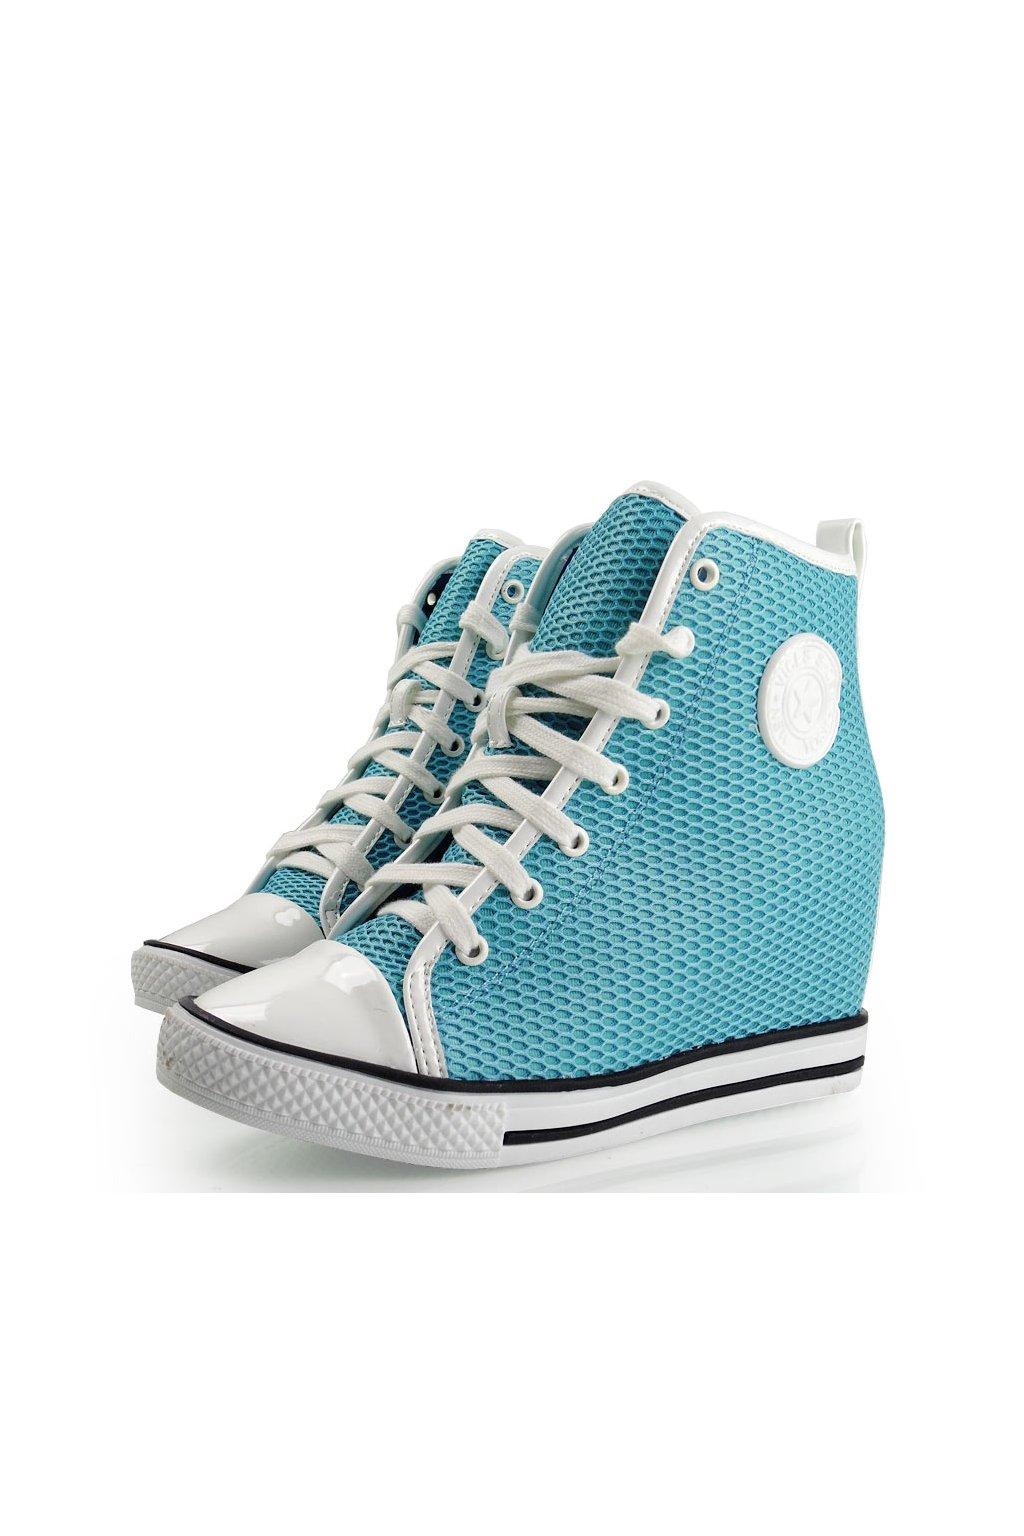 1a12658bb2 Platformové tenisky modré